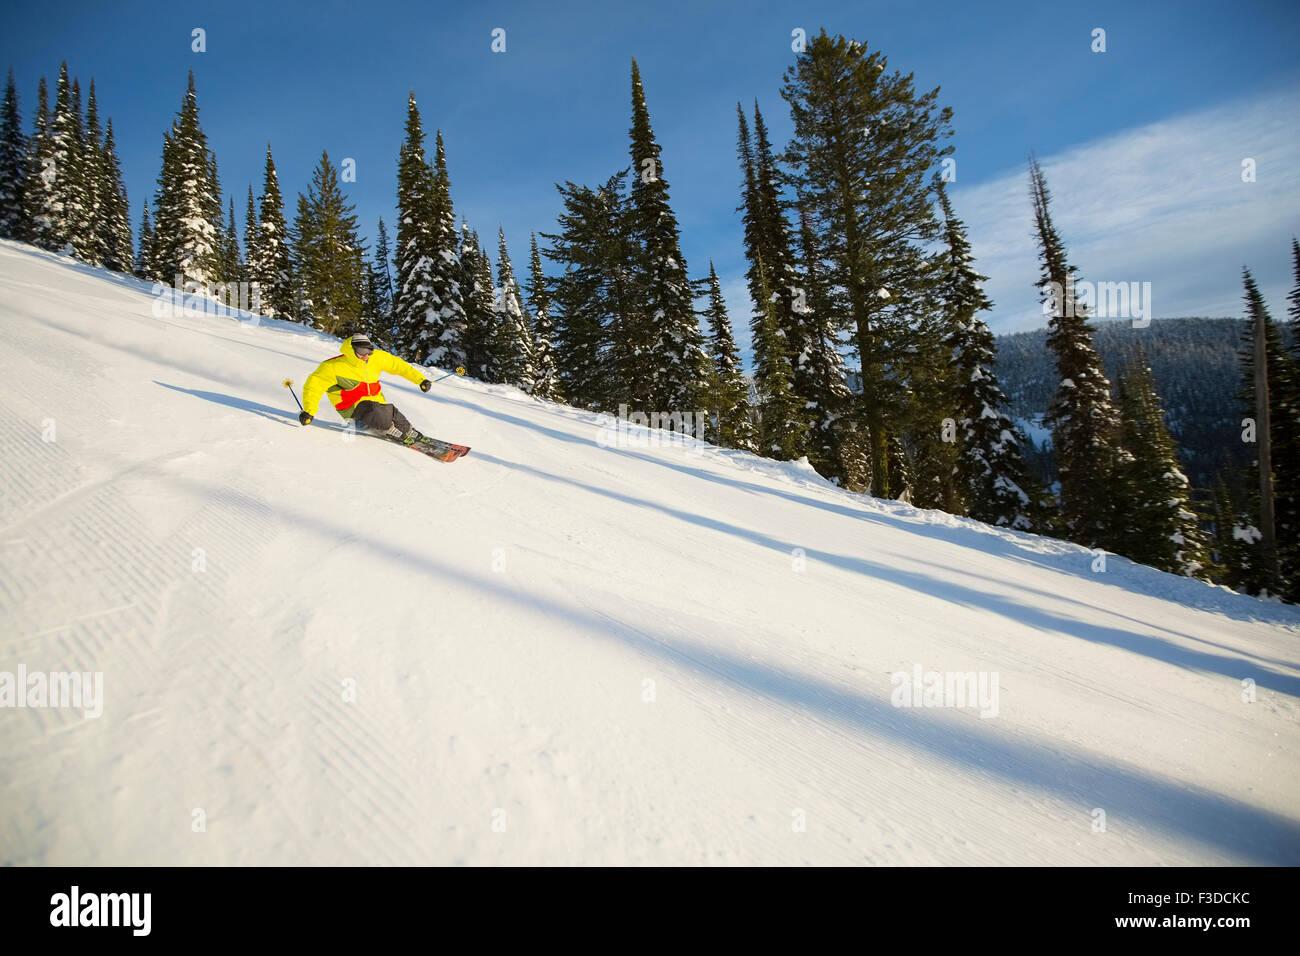 Low angle view of young man on ski slope - Stock Image